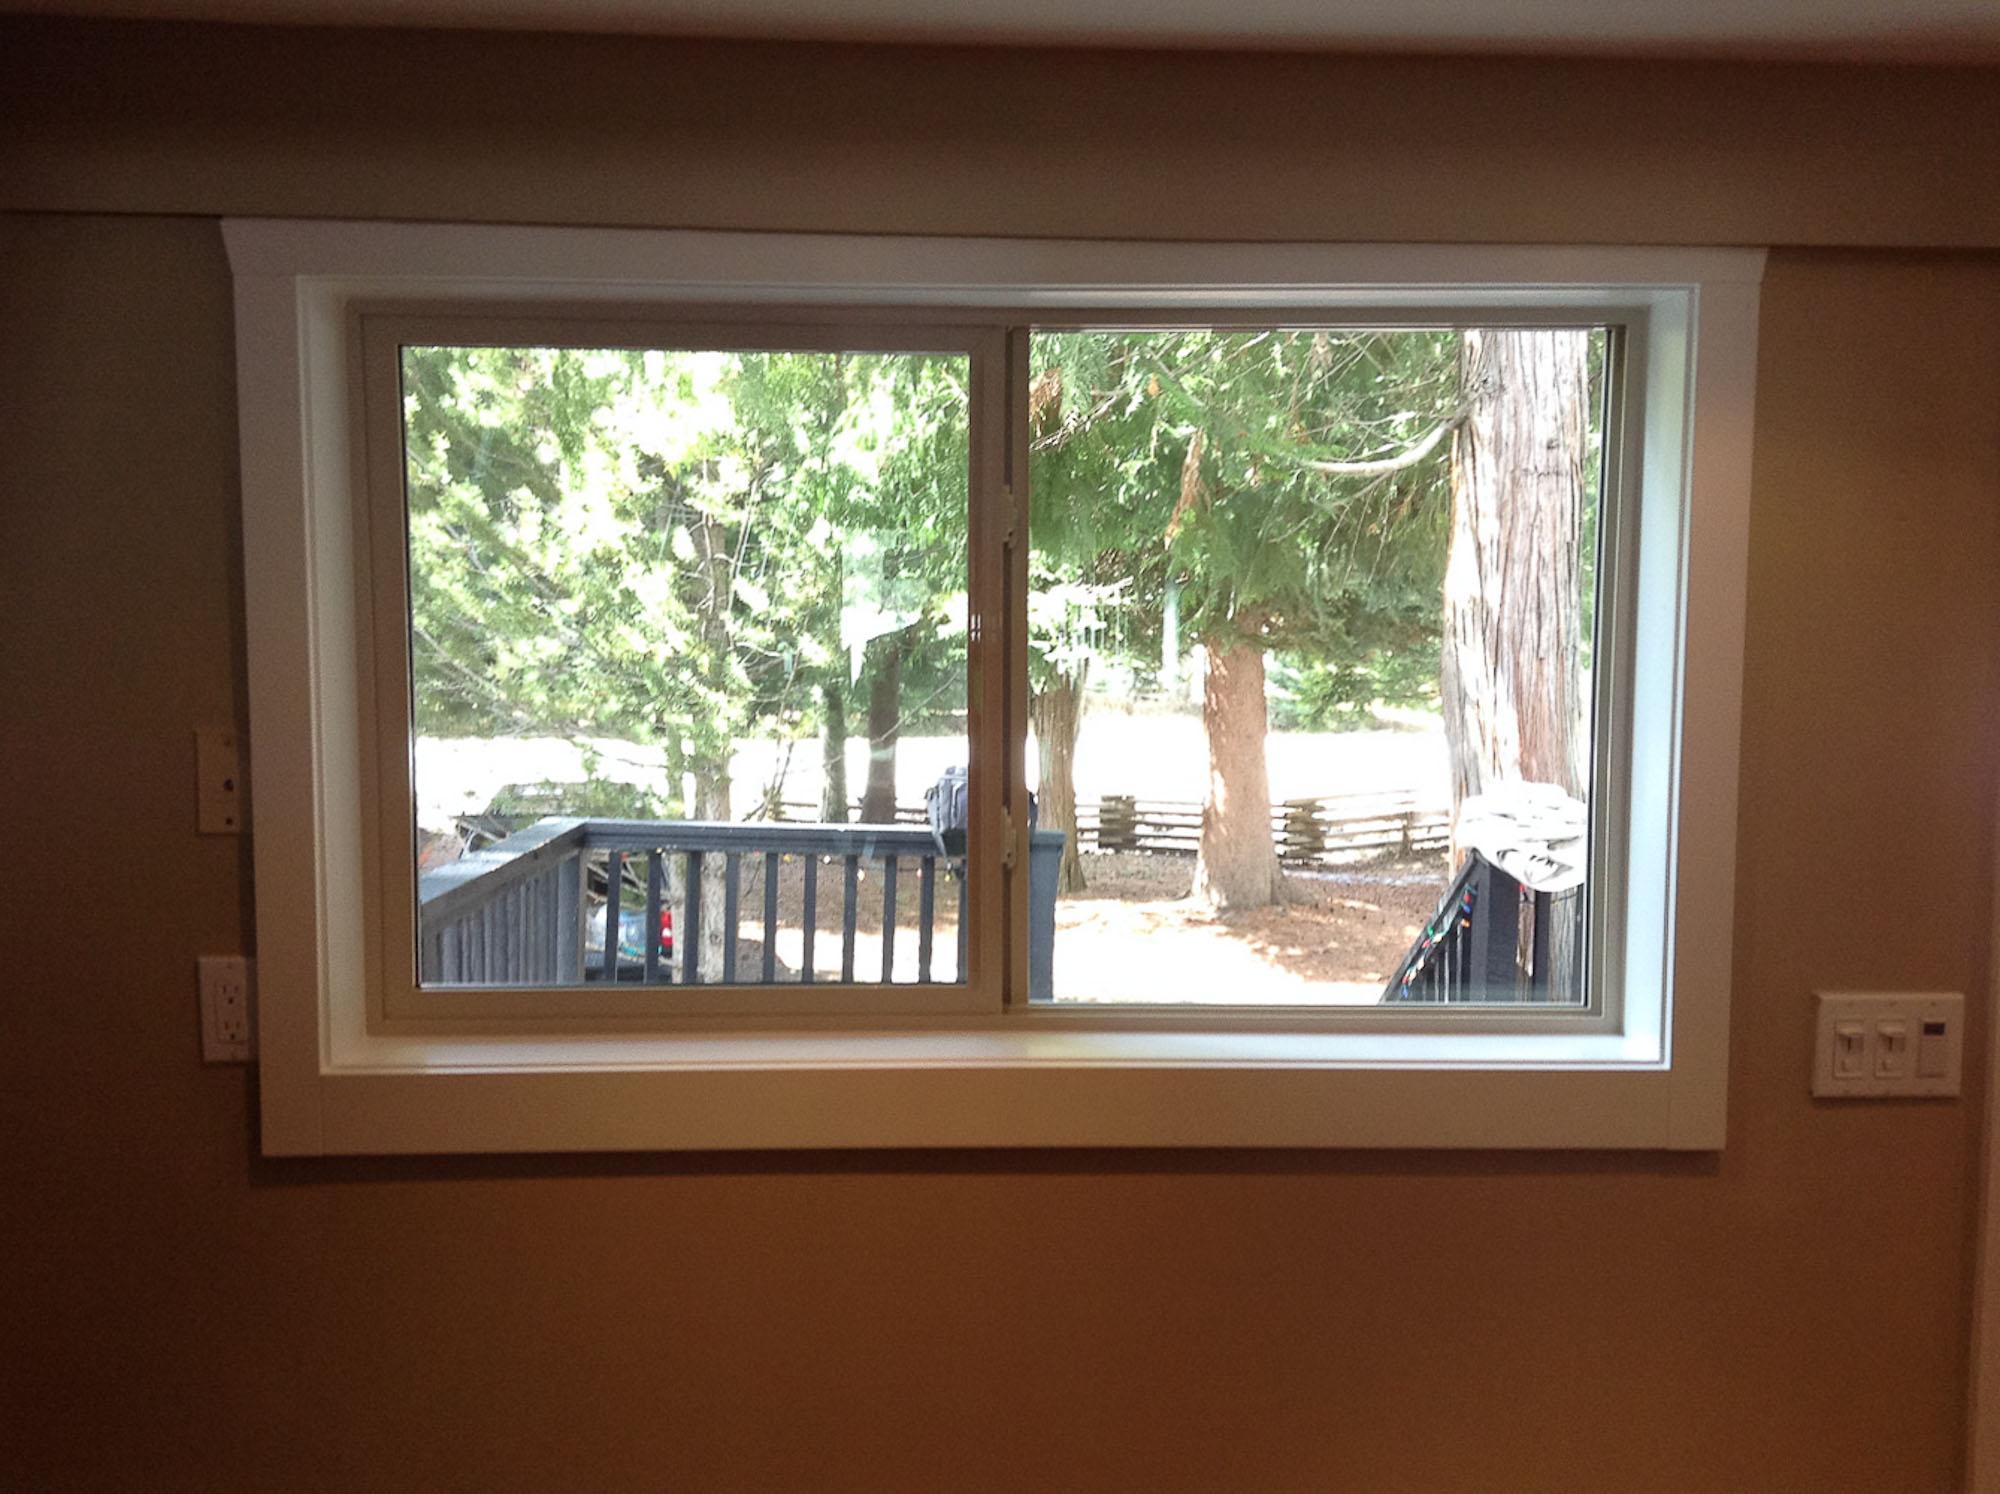 Tapleys- Window and deck replacement-11.jpg